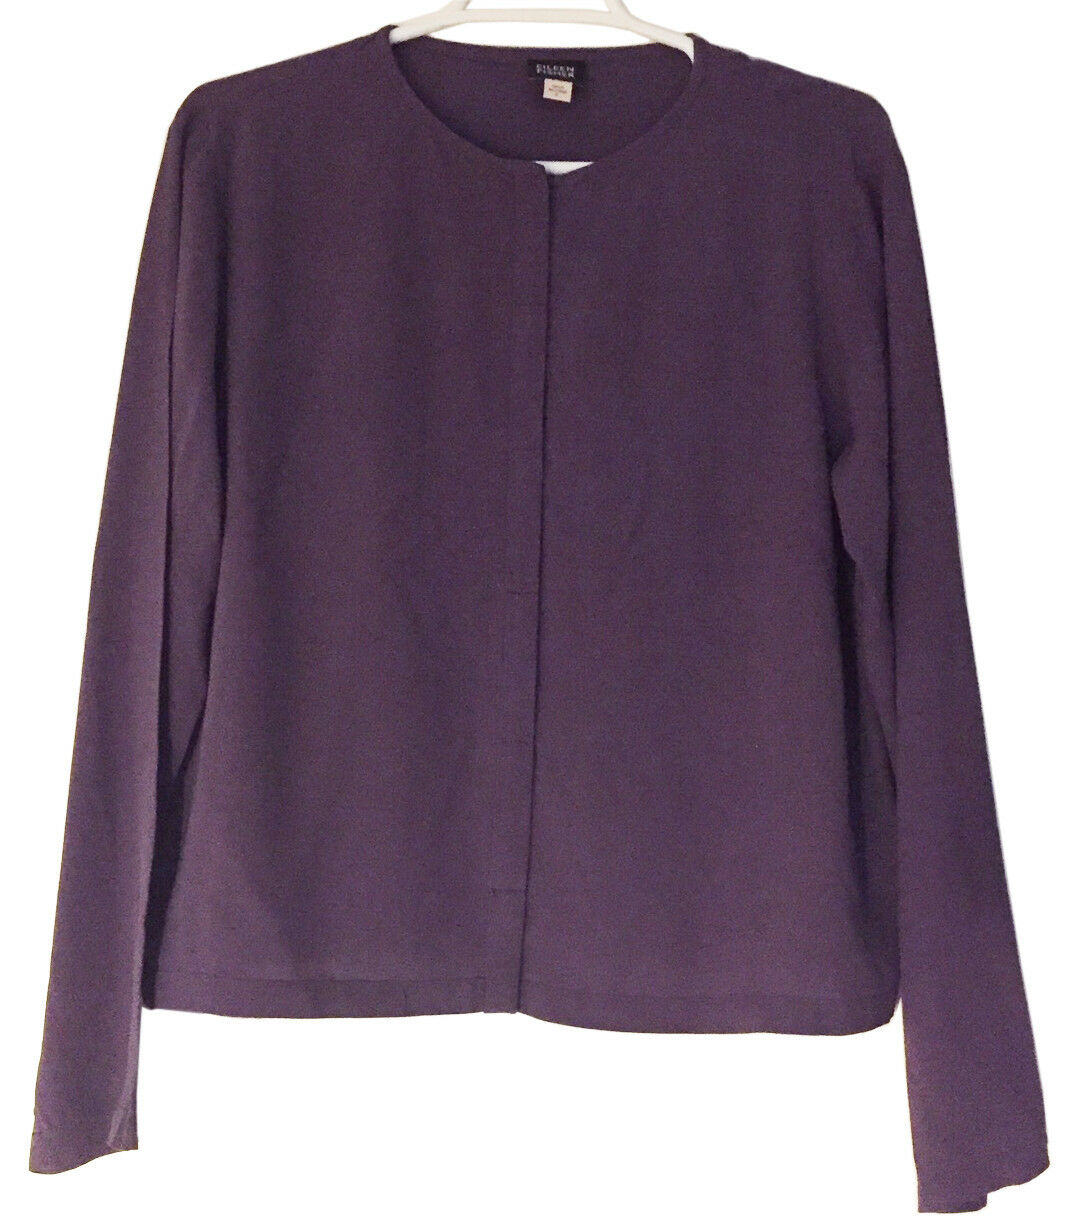 EILEEN FISHER Silk Crepe Button-Front Long Sleeve Blouse Shirt Sz M lila Grape